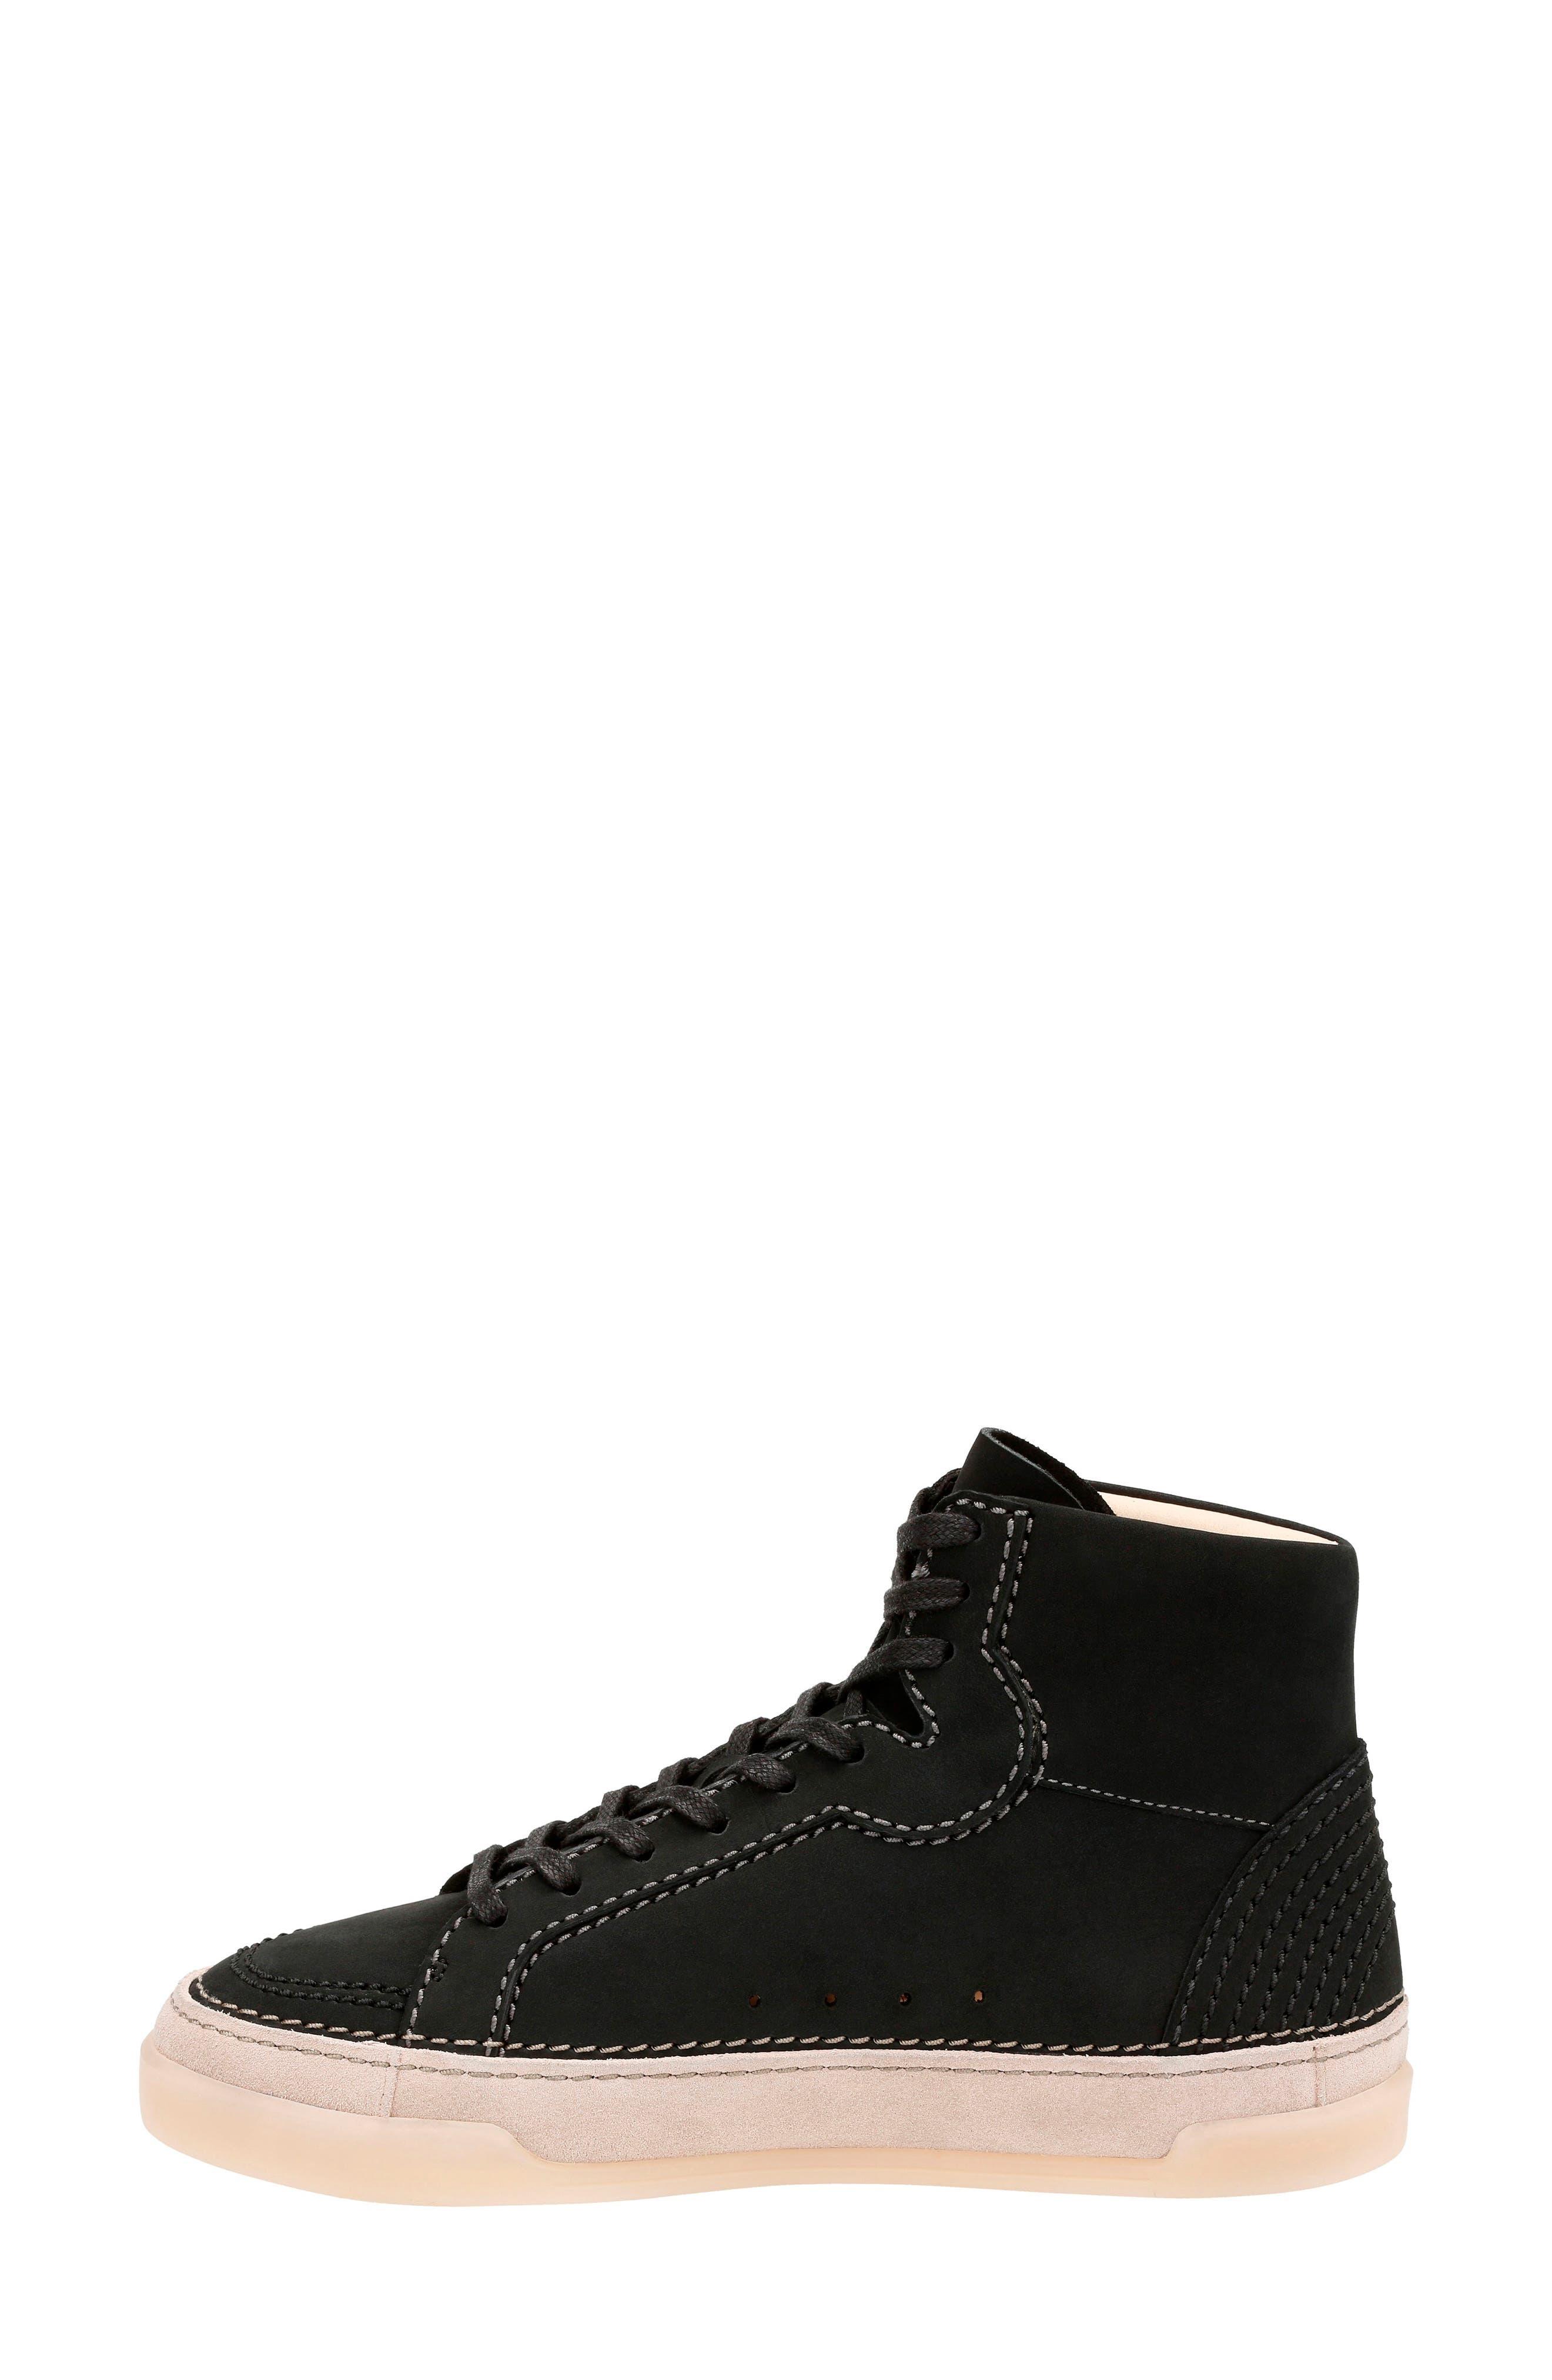 Hidi Haze High Top Sneaker,                             Alternate thumbnail 3, color,